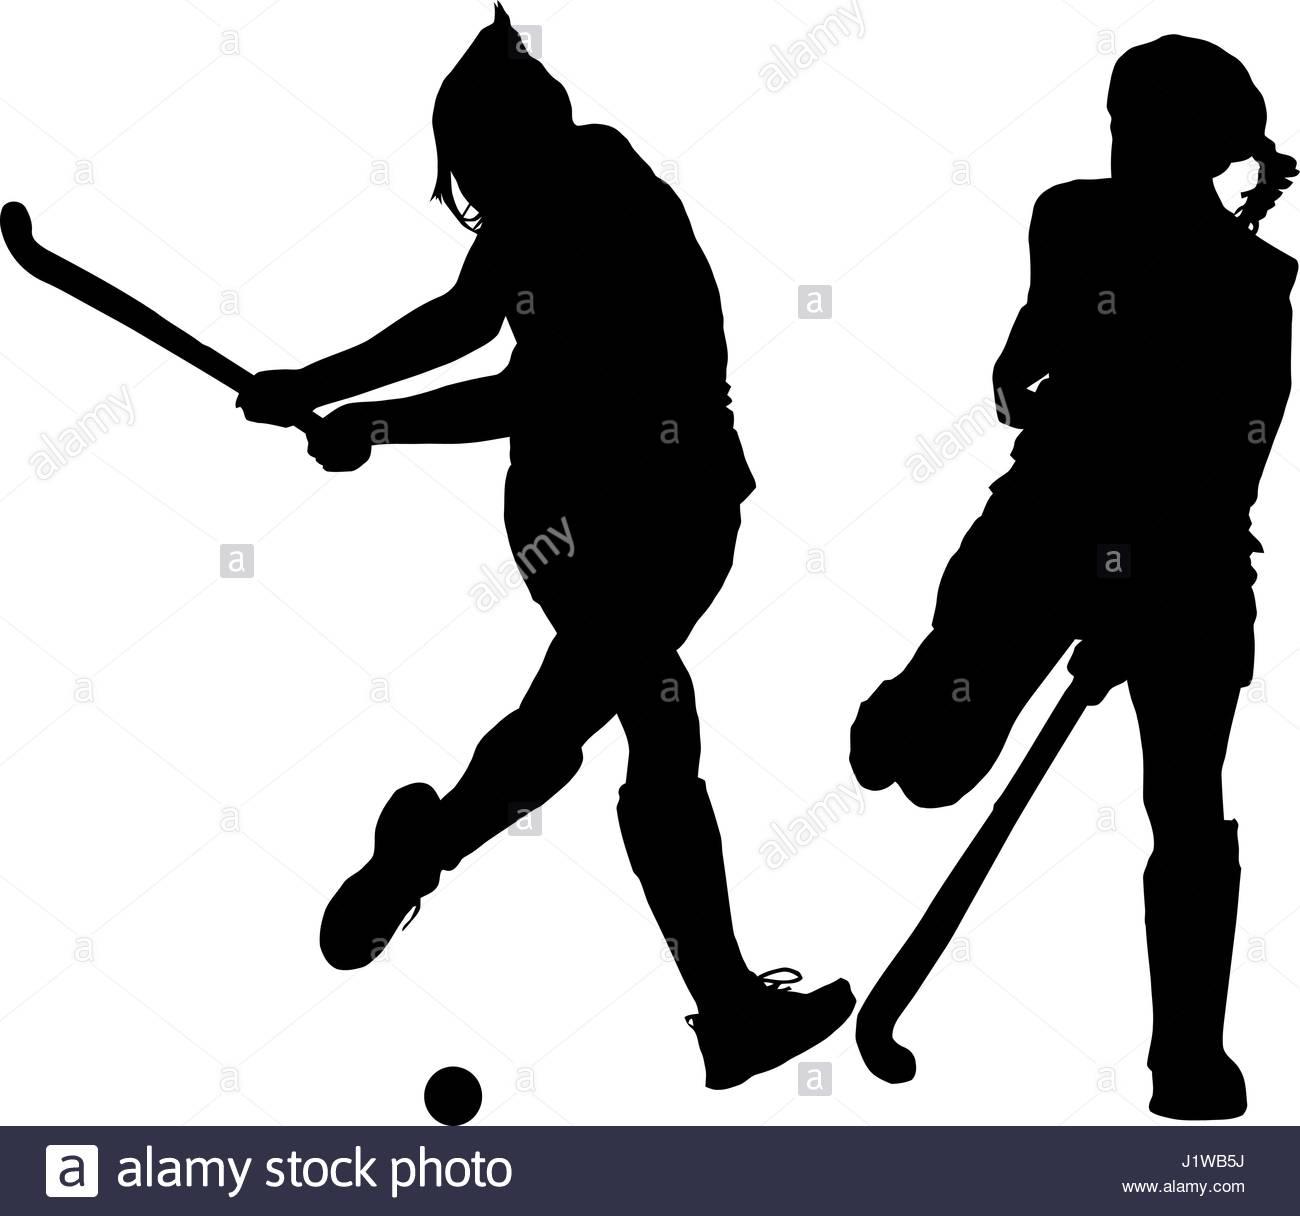 1300x1216 Black On White Silhouette Of Girls Ladies Hockey Players Hitting